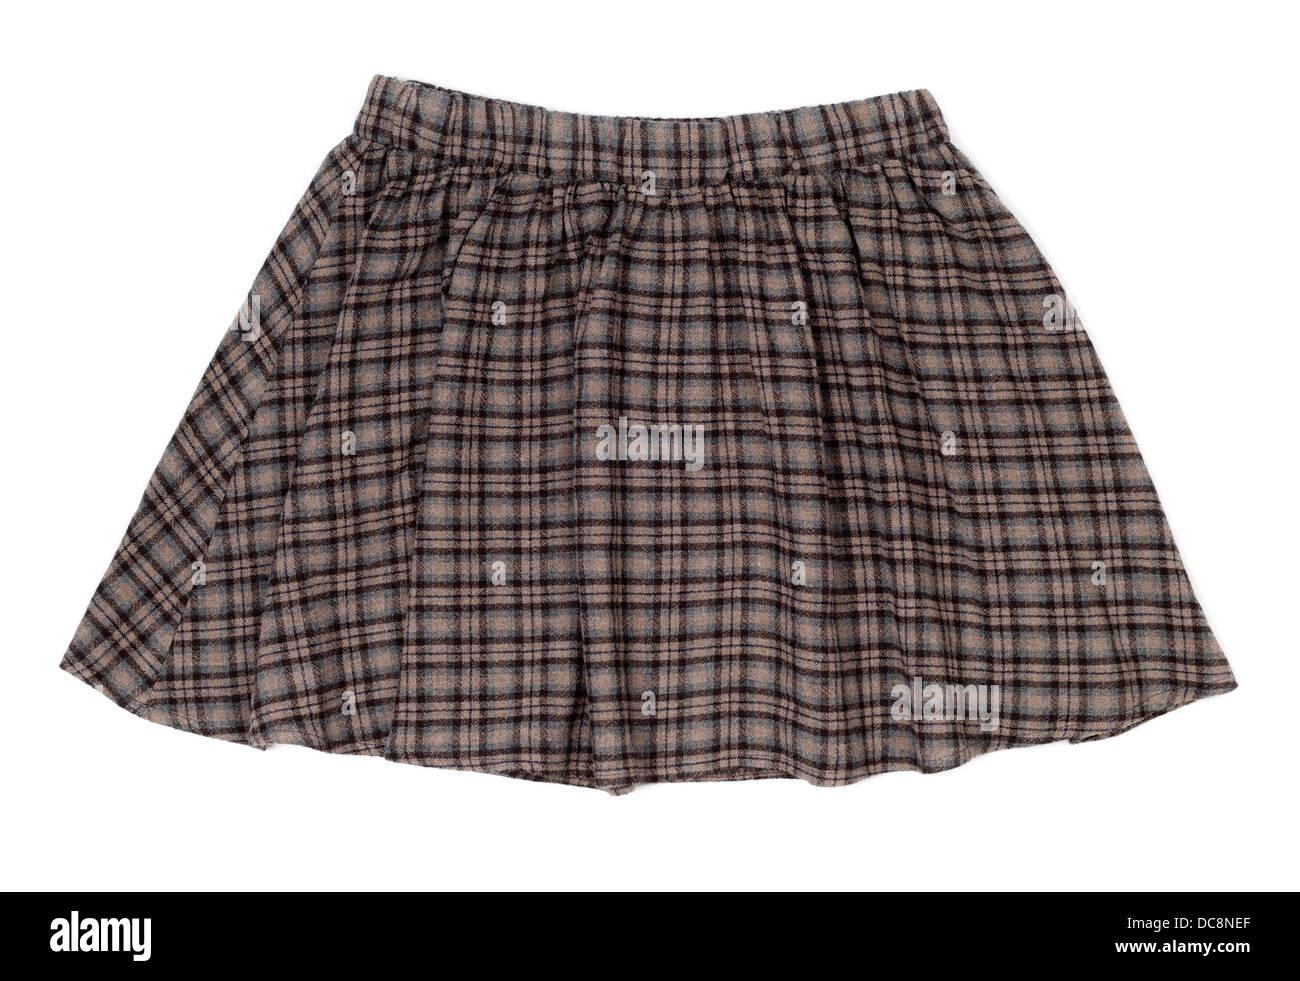 86f19b797f932c Plaid Skirt Stock Photos & Plaid Skirt Stock Images - Alamy